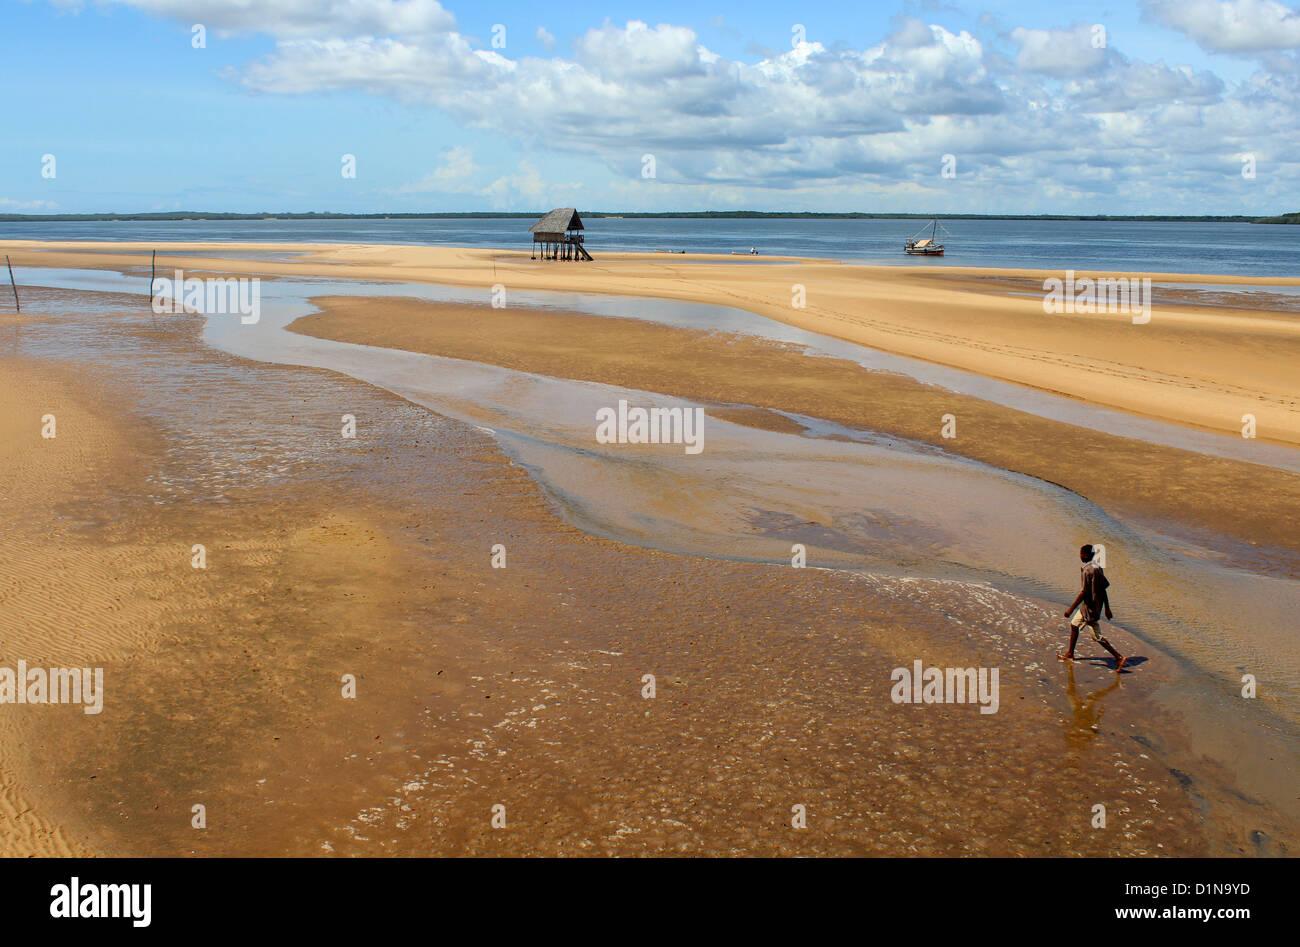 Beach and shore front at the Kipungani Explorer beach resort, Lamu Island, Kenya, East Africa - Stock Image